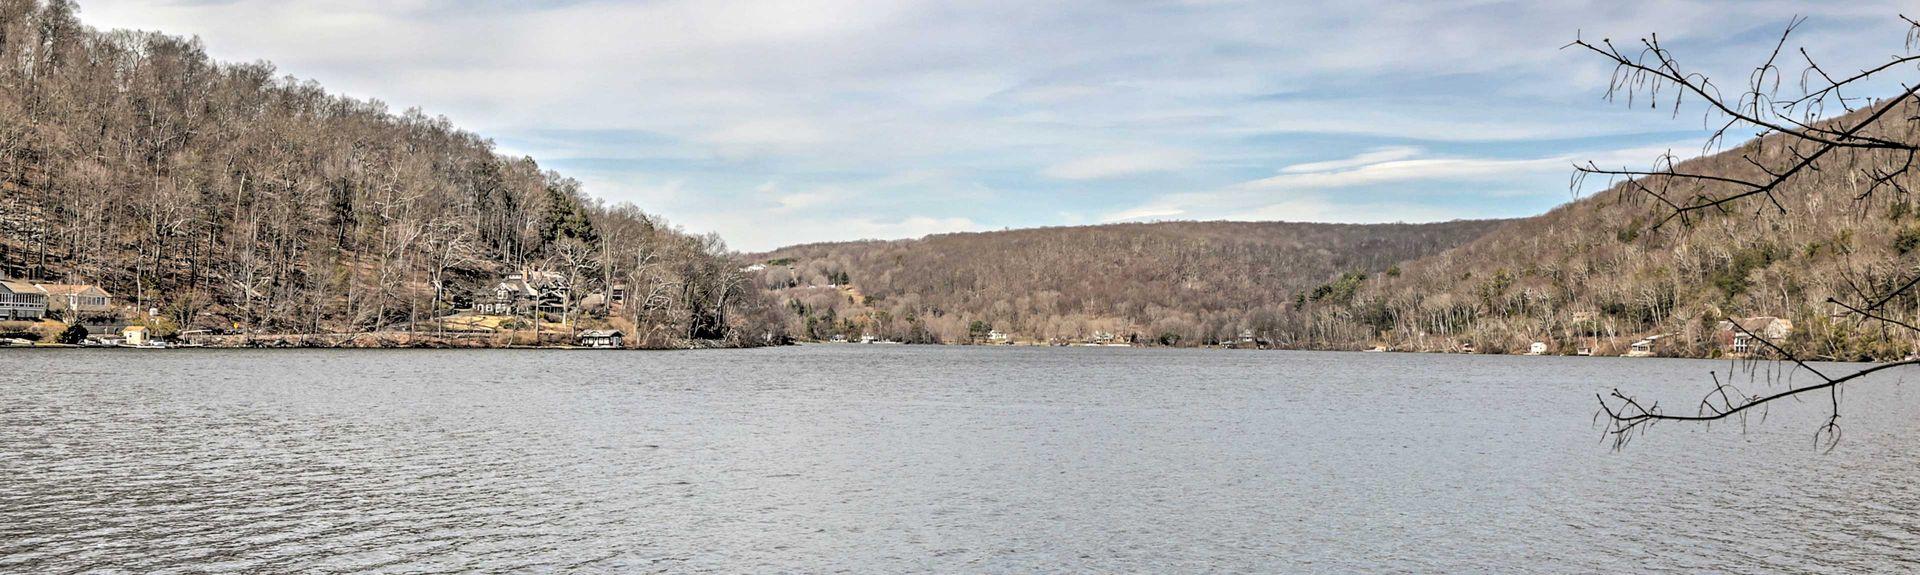 Bantam Lake, CT, USA